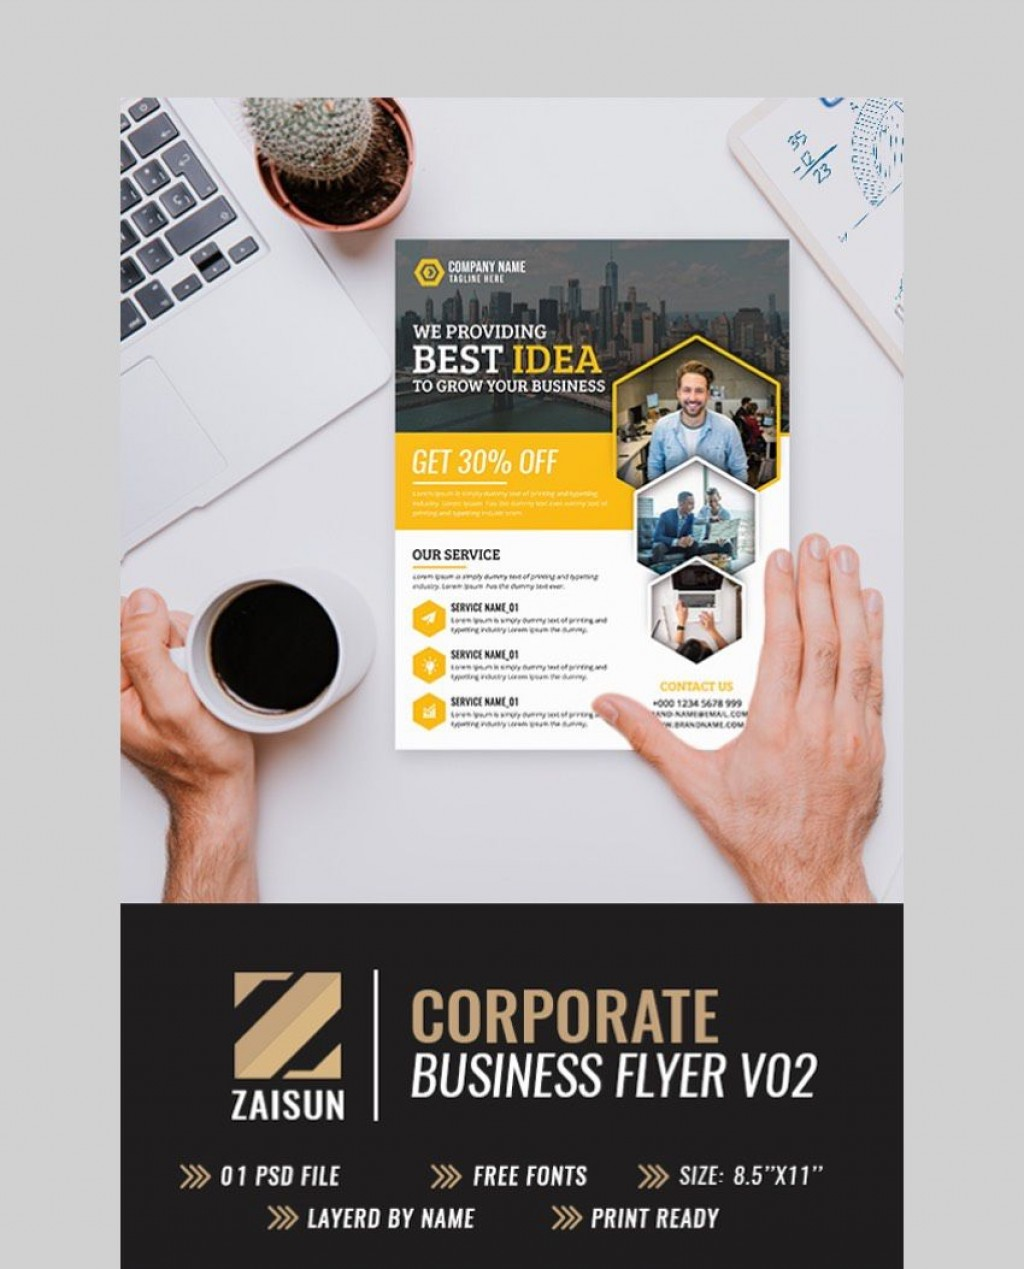 007 Simple Free Flyer Design Template High Def  Templates Online Download PsdLarge